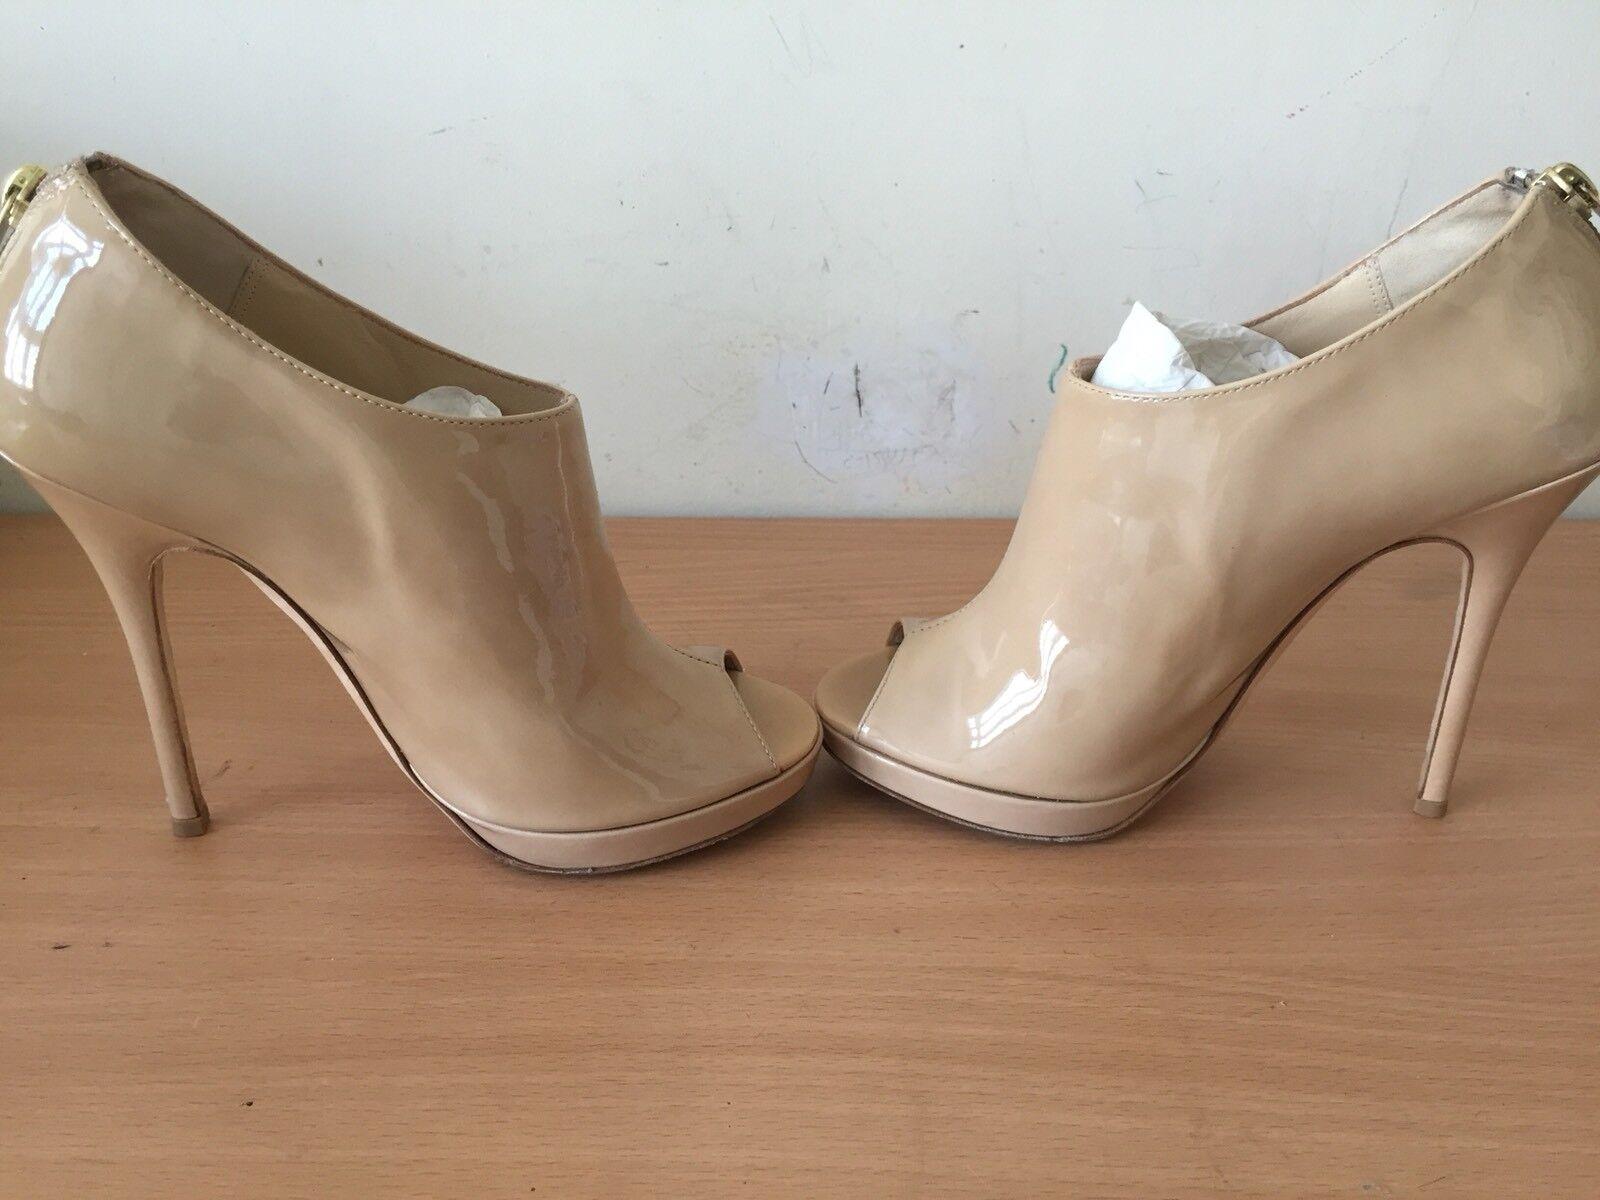 Jimmy Choo 36,5 Reino elegante Unido 3,5 Beige Glint botas, elegante Reino 8636c1